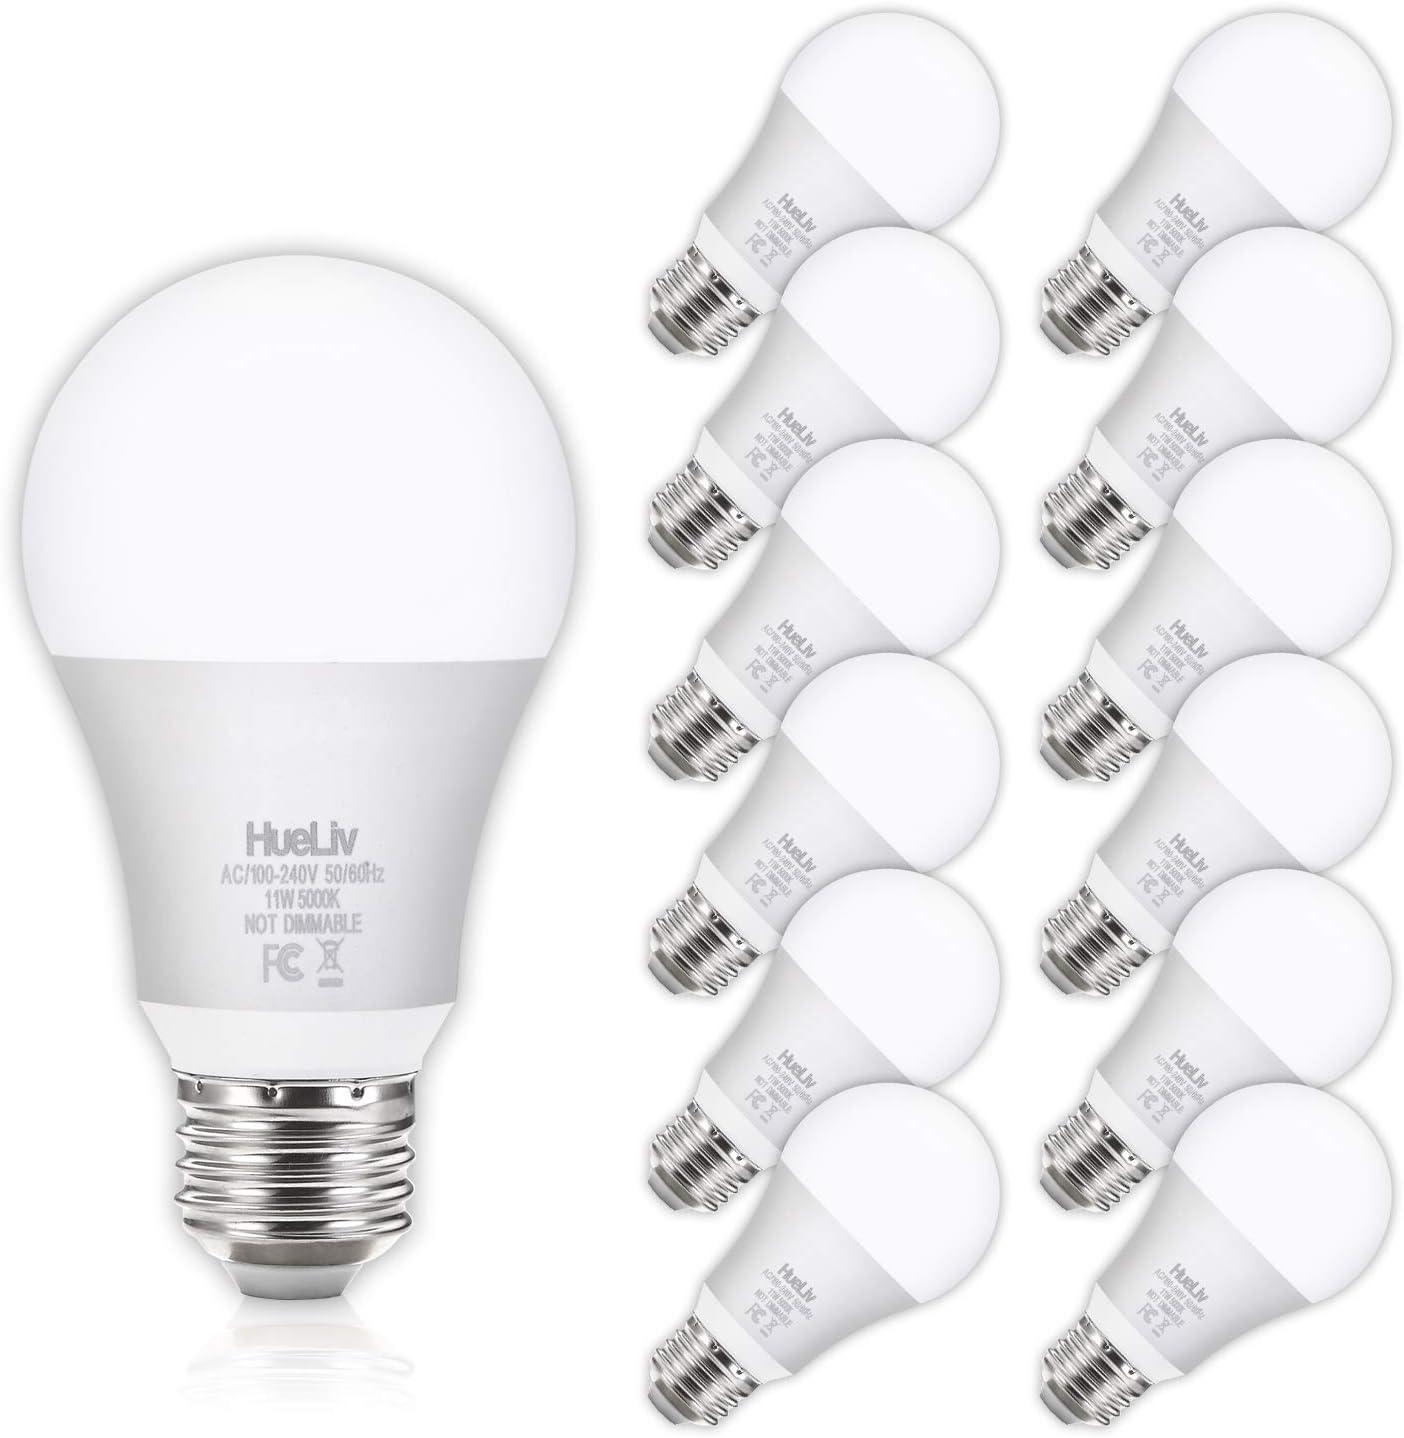 12pack A19 Led Light Bulbs 100 Watt Equivalent 5000k Daylight White No Flicker E26 Medium Screw Base Bulbs 1100lumens Non Dimmable Amazon Com